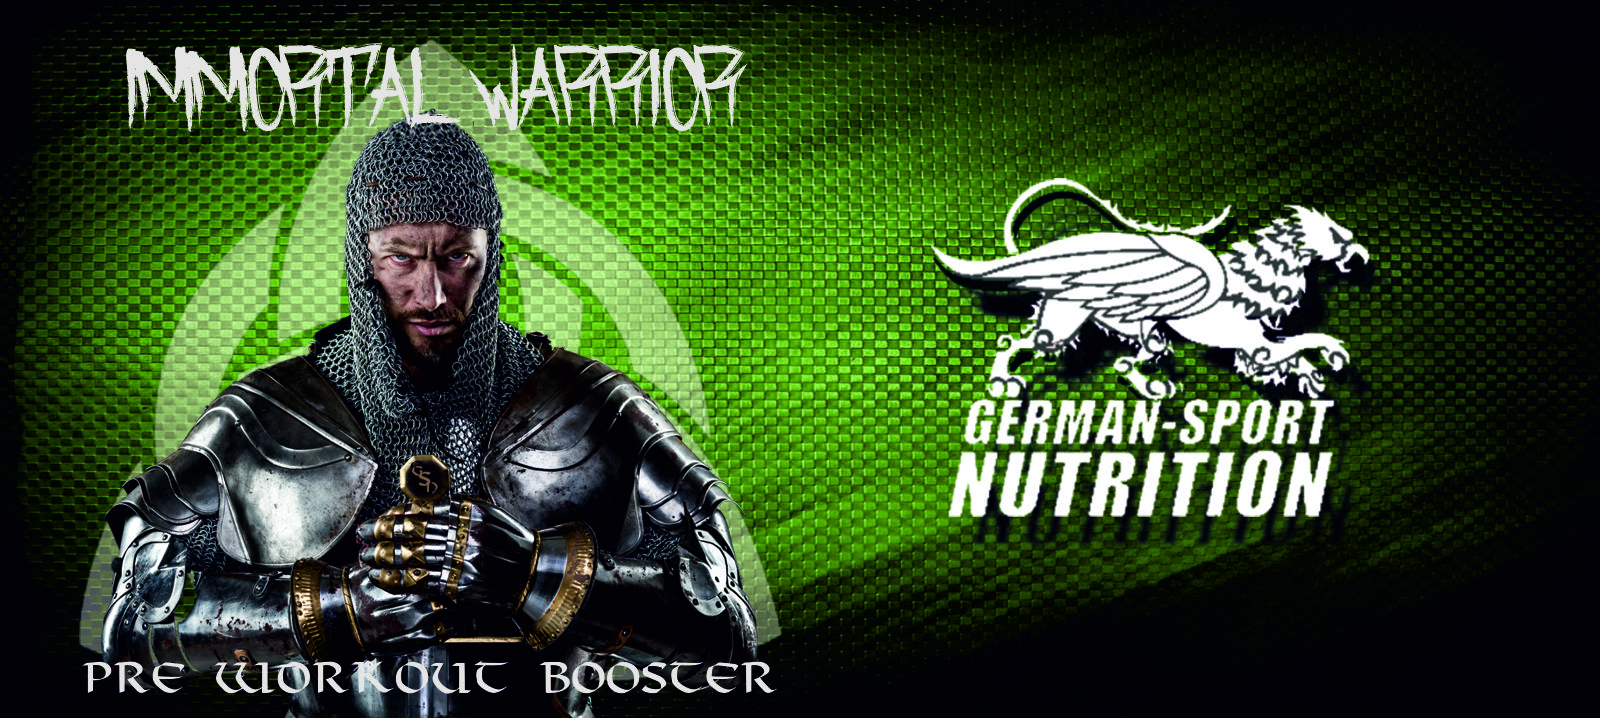 Immortal Warrior Pre Workout Supplement